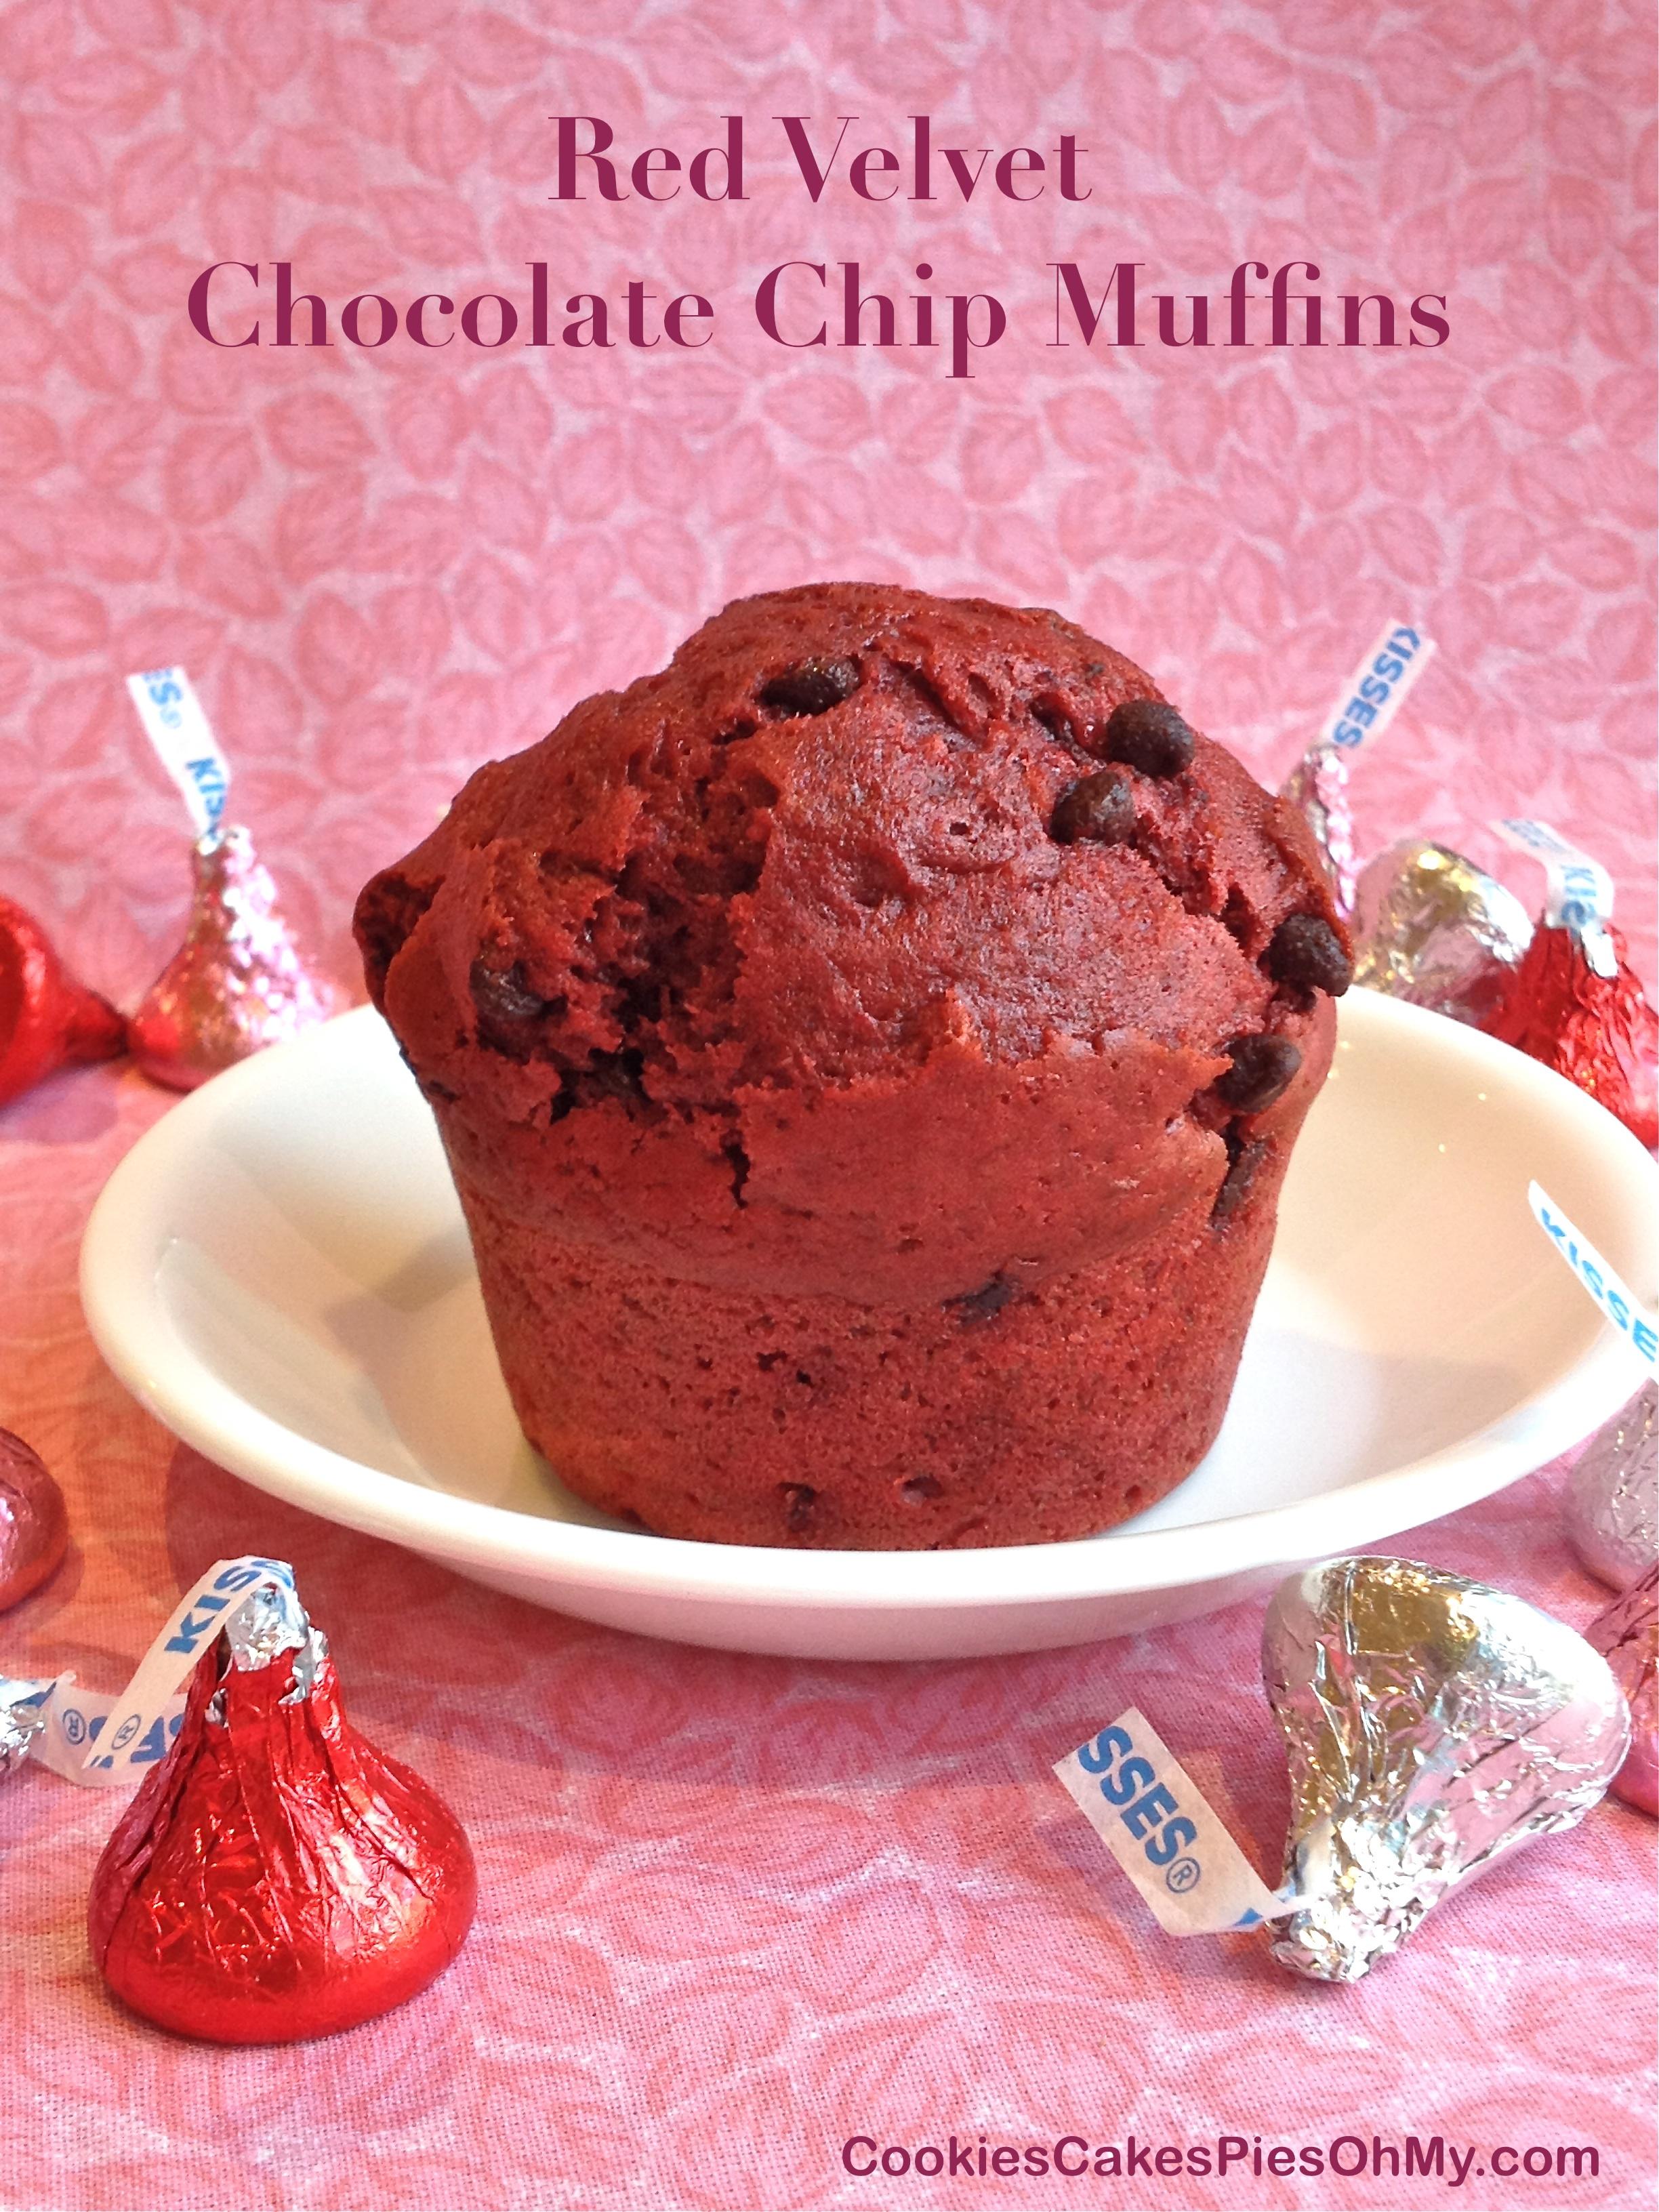 Red Velvet Chocolate Chip Muffins | CookiesCakesPiesOhMy